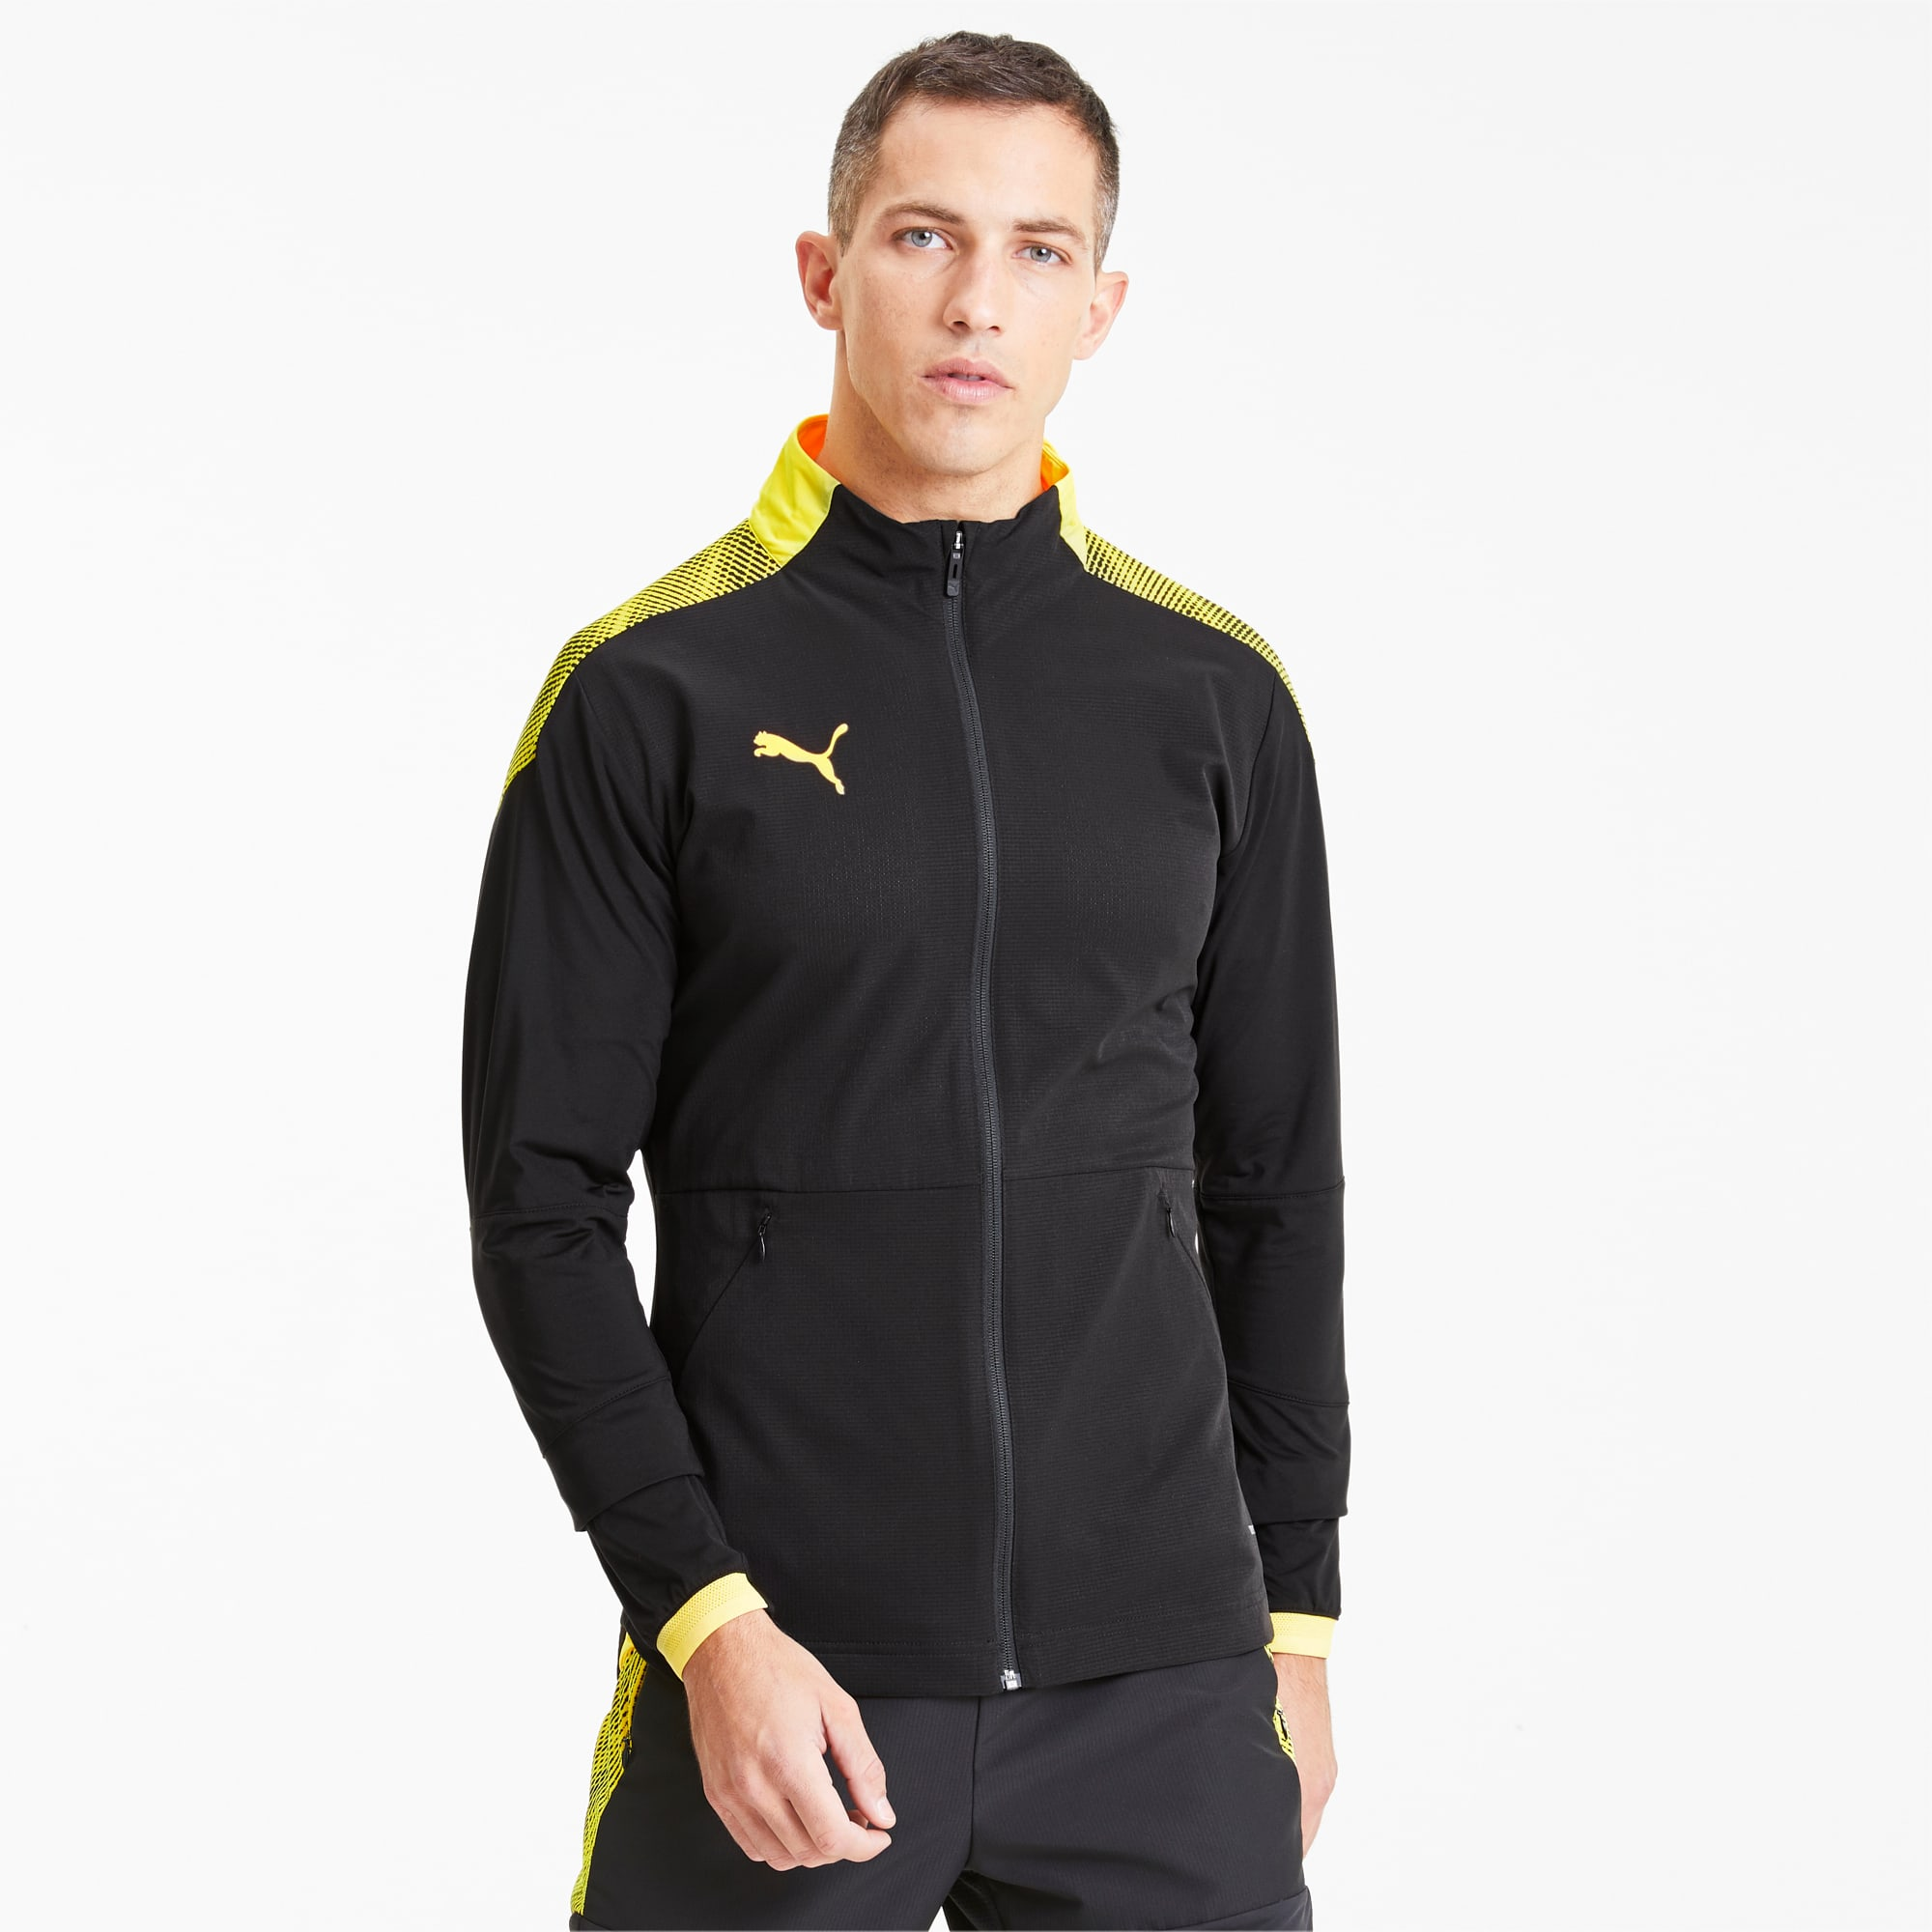 ftblNXT Pro Men's Training Jacket